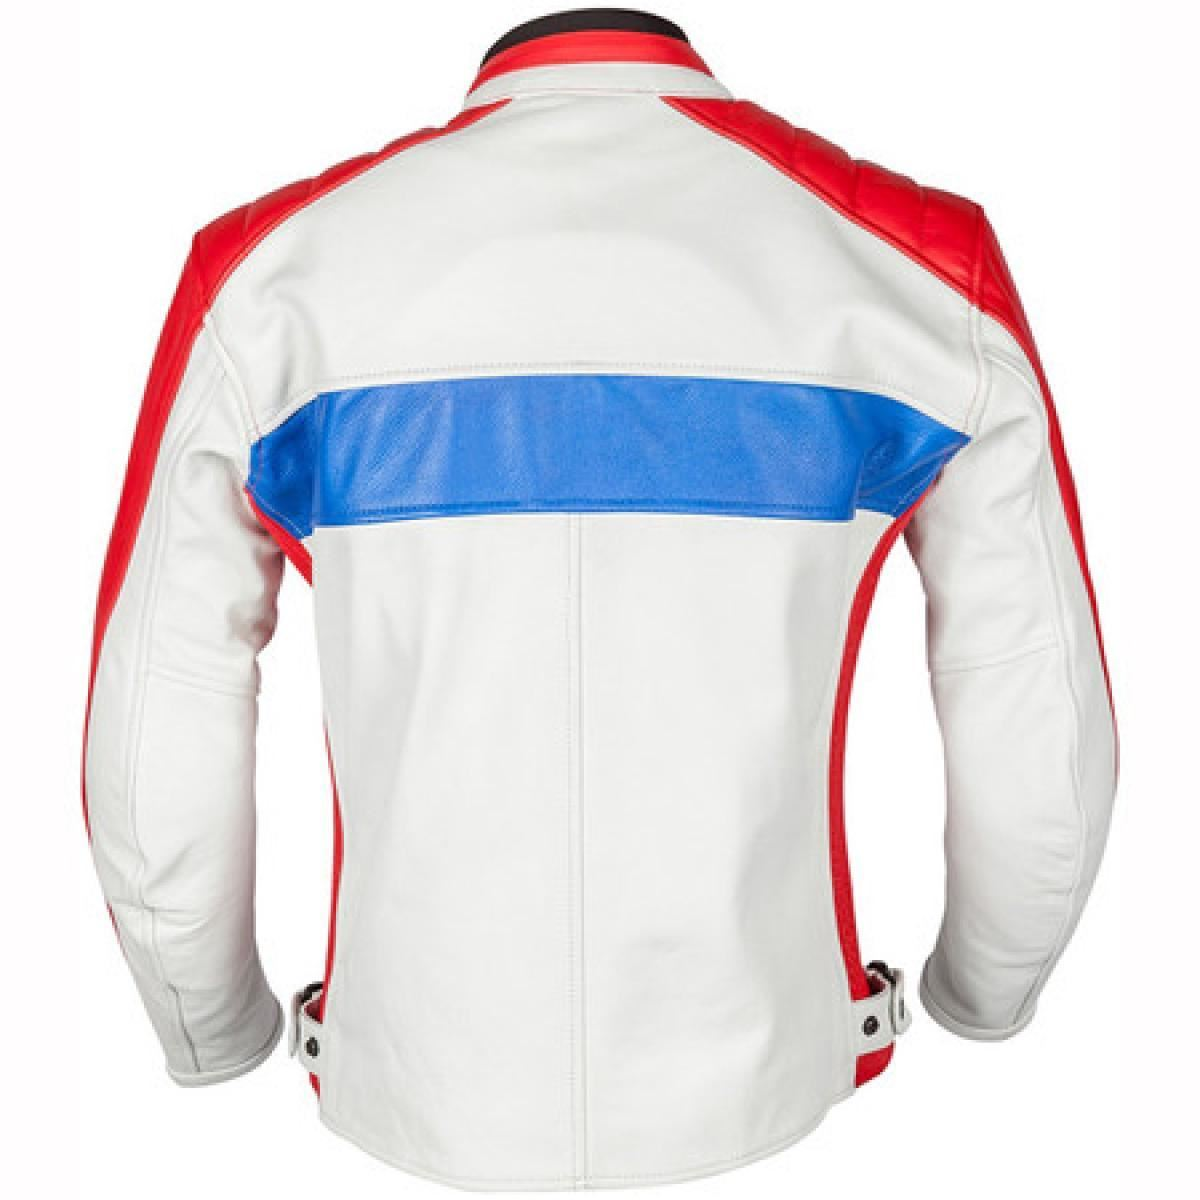 Spada-Turismo-Hommes-Veste-Moto-Blanc-Vintage-Impermeable-Renfort-Ce miniature 10